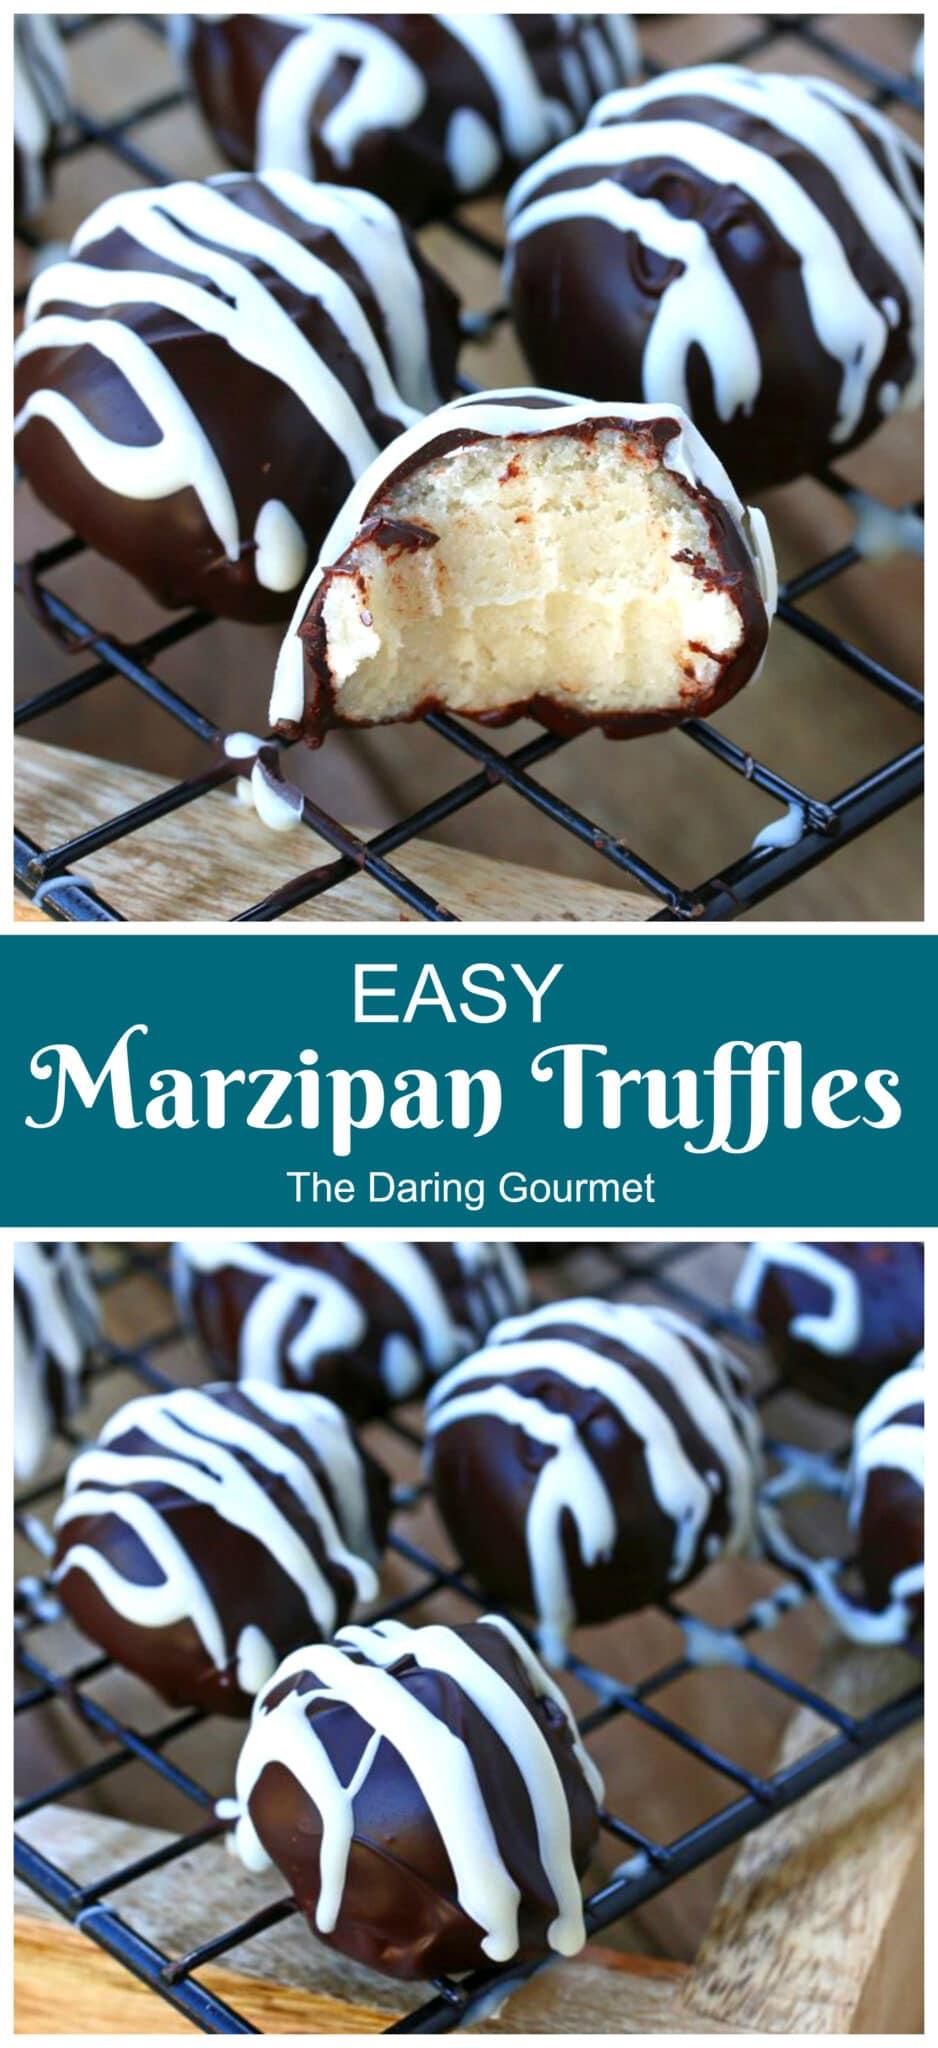 marzipan truffles recipe chocolate easy